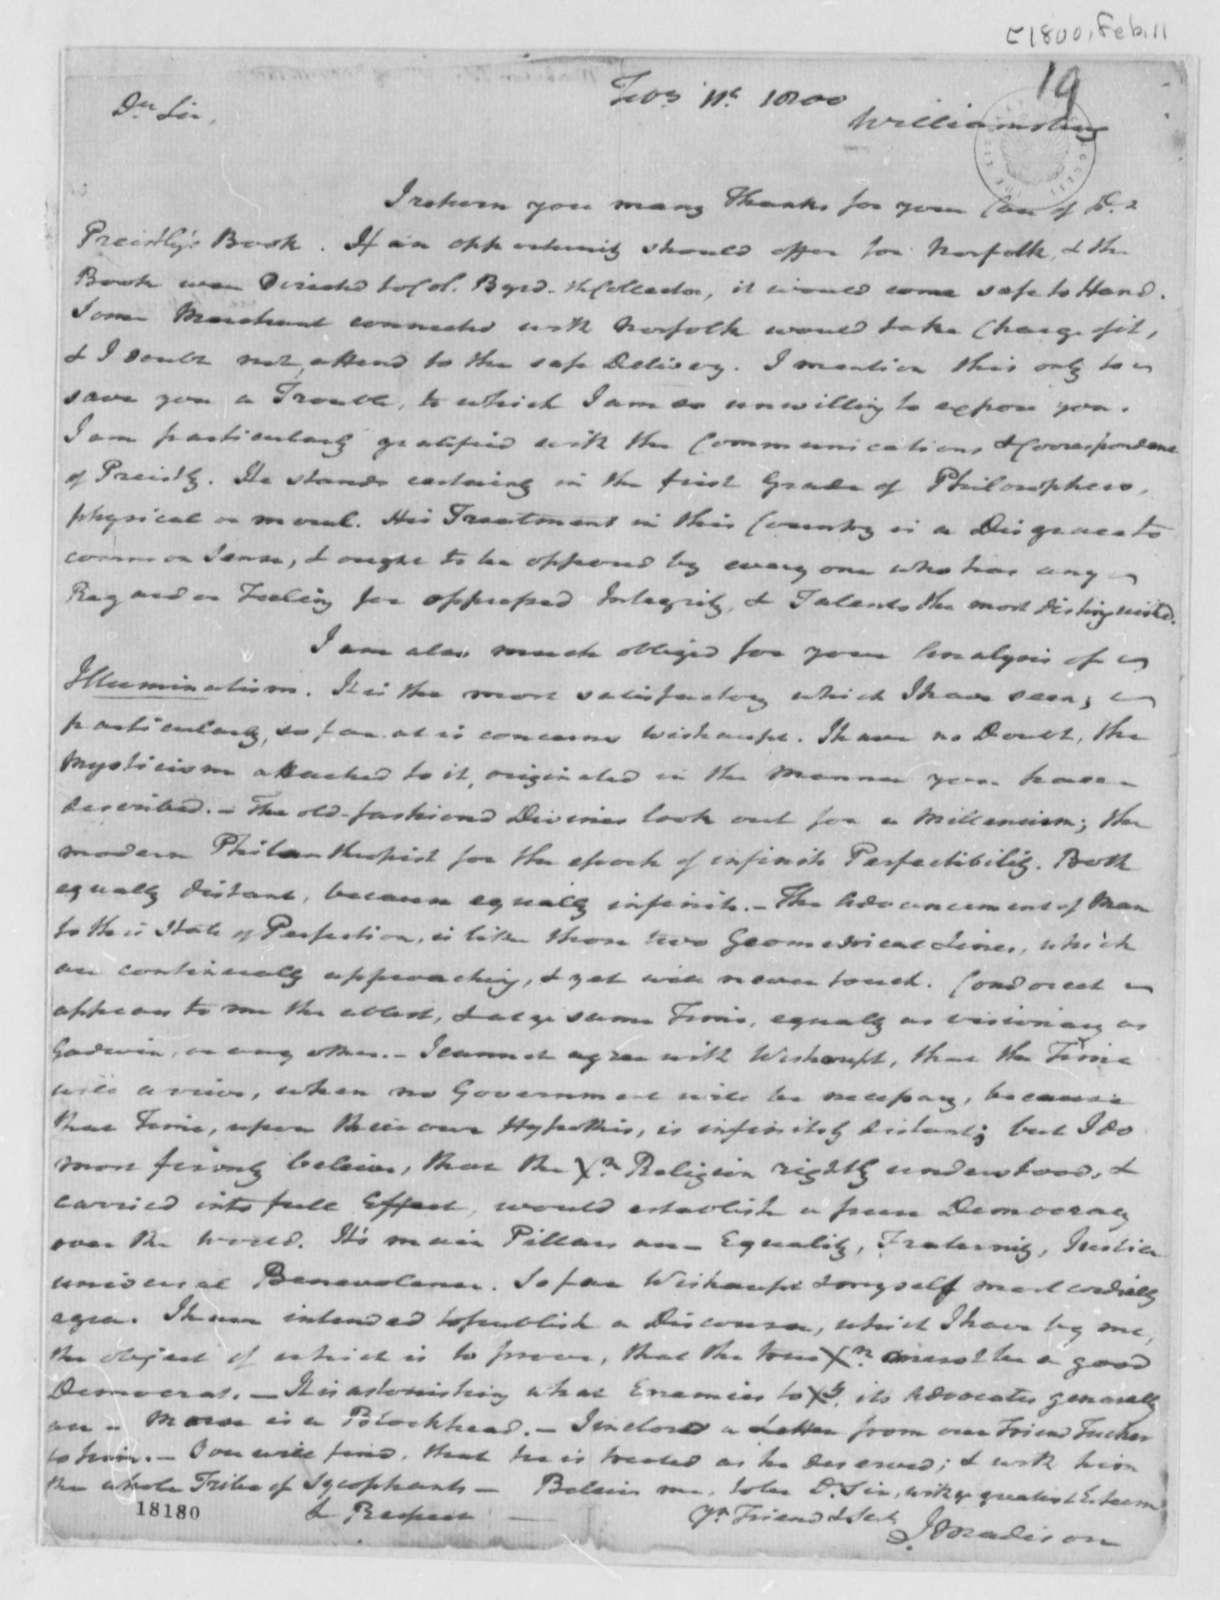 Reverend James Madison to Thomas Jefferson, February 11, 1800